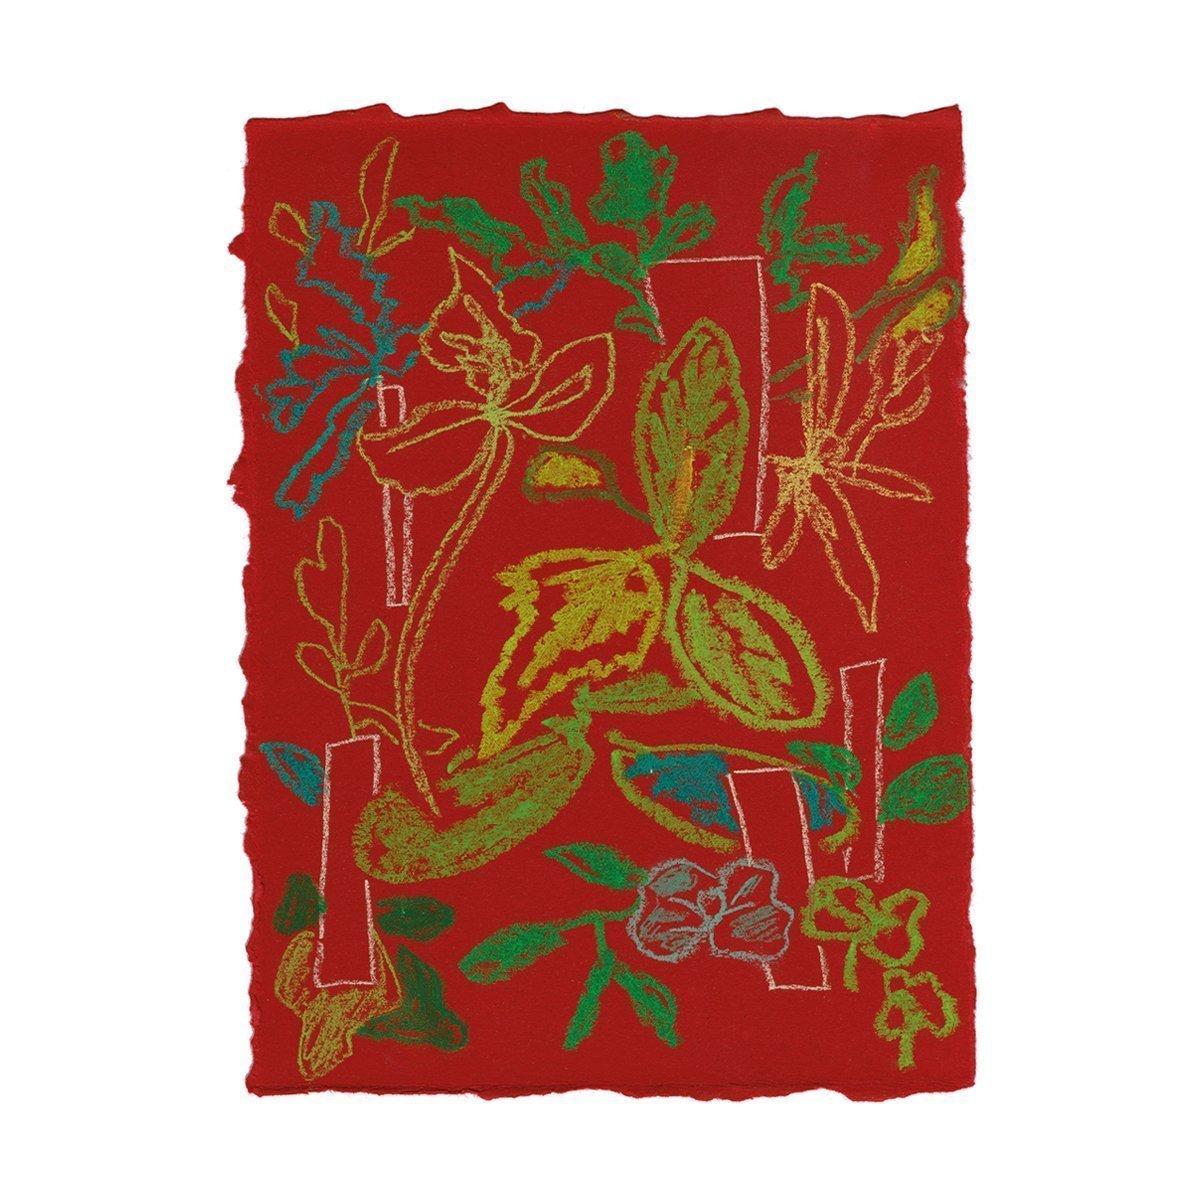 Moooi Carpets Sprouts Vloerkleed - Low Pile - 150 x 200 cm.